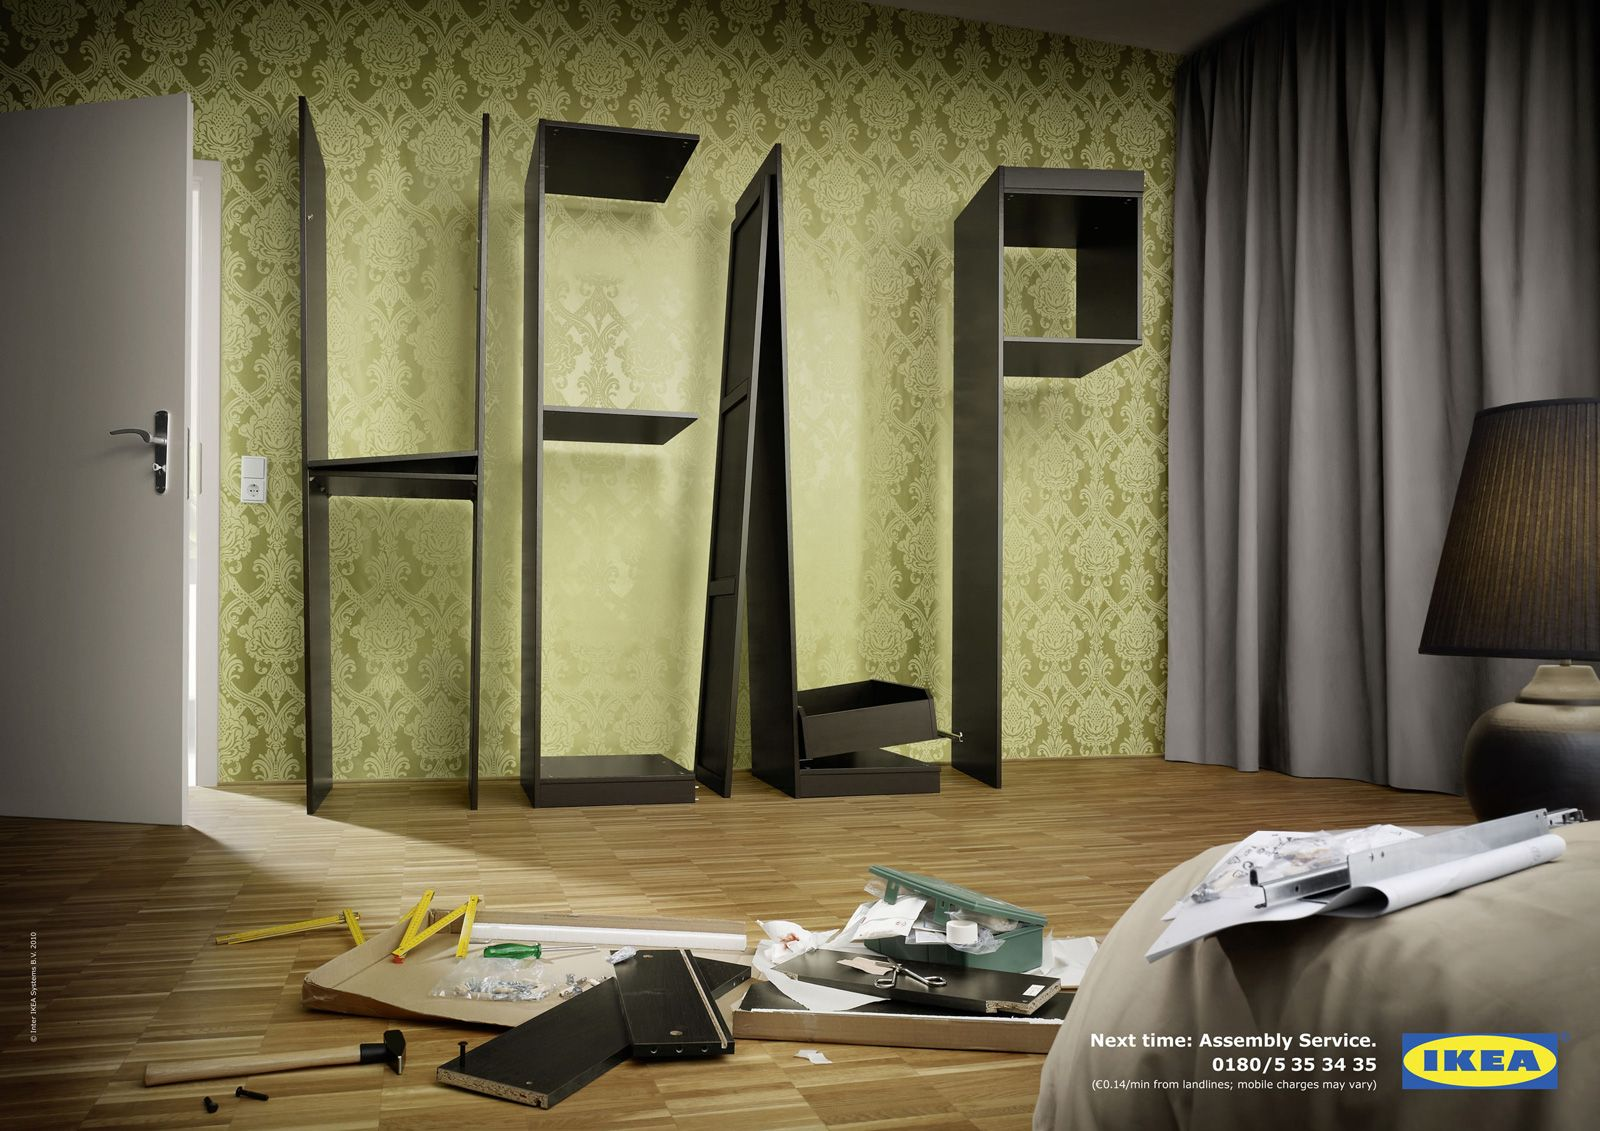 When un-handy people build Ikea furniture - for Ikea